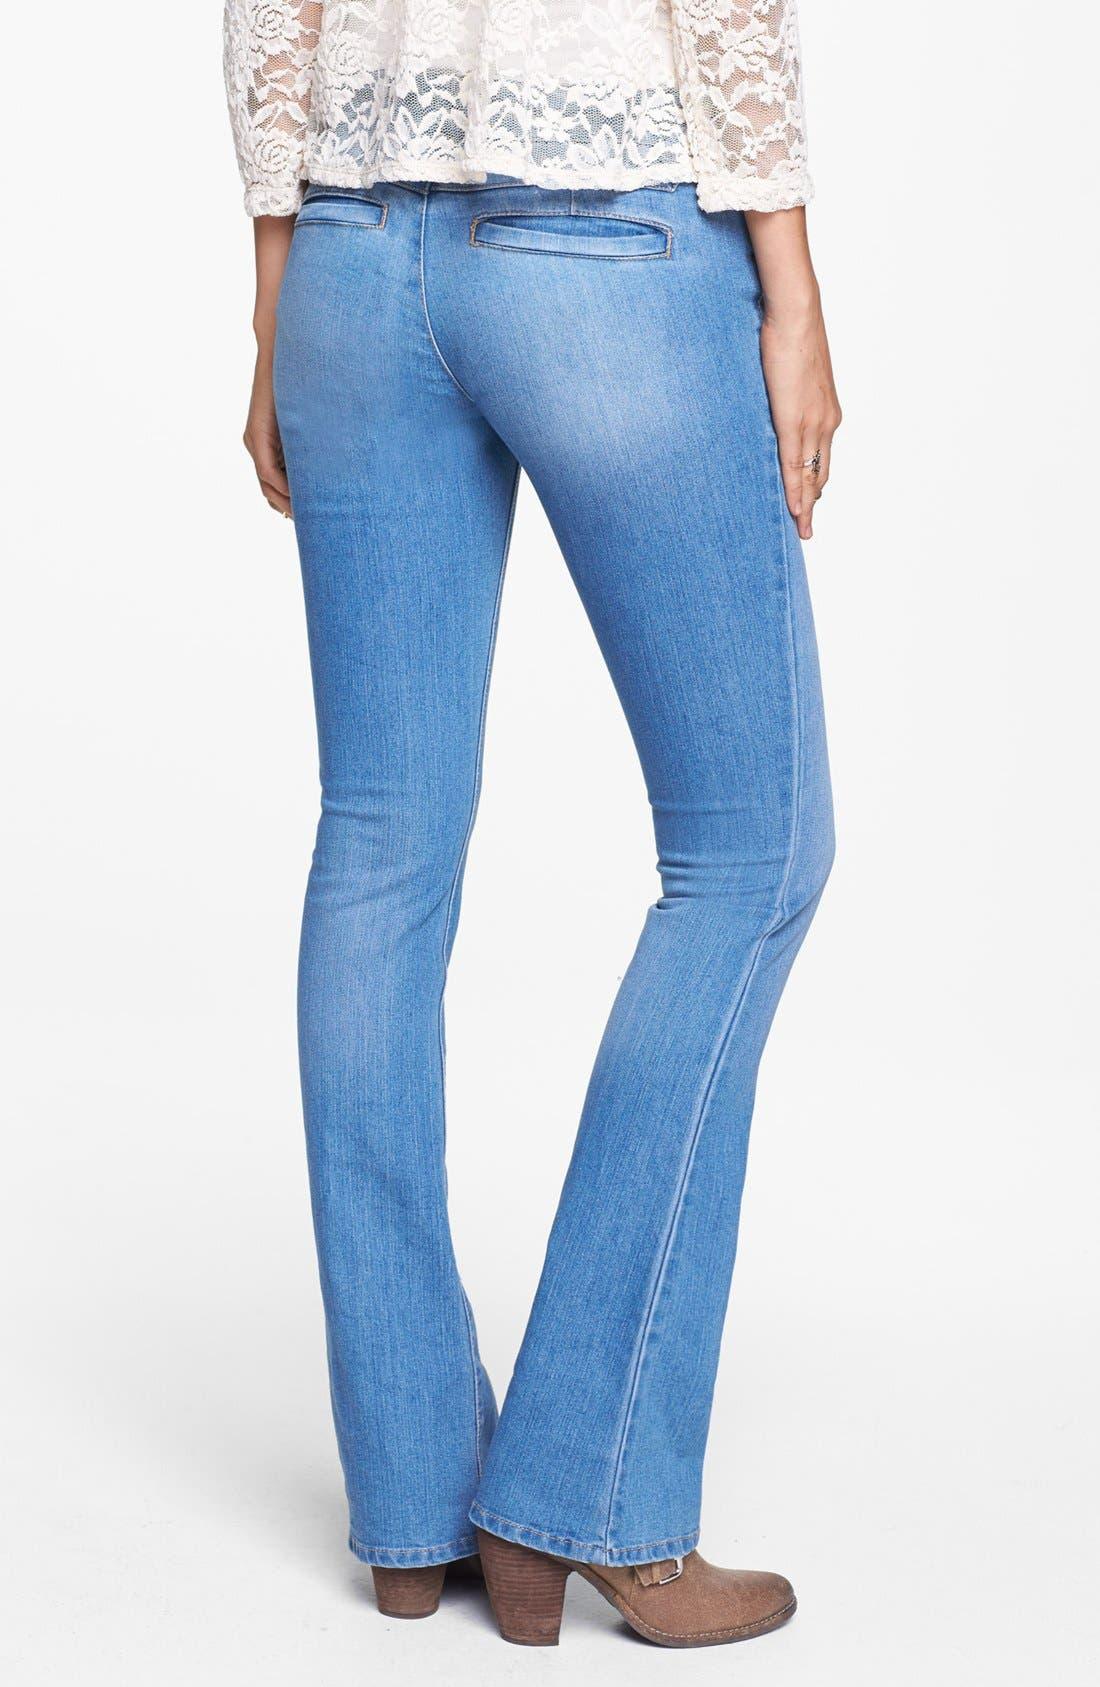 Alternate Image 2  - Jolt Welt Pocket Bootcut Jeans (Light) (Juniors) (Online Only)